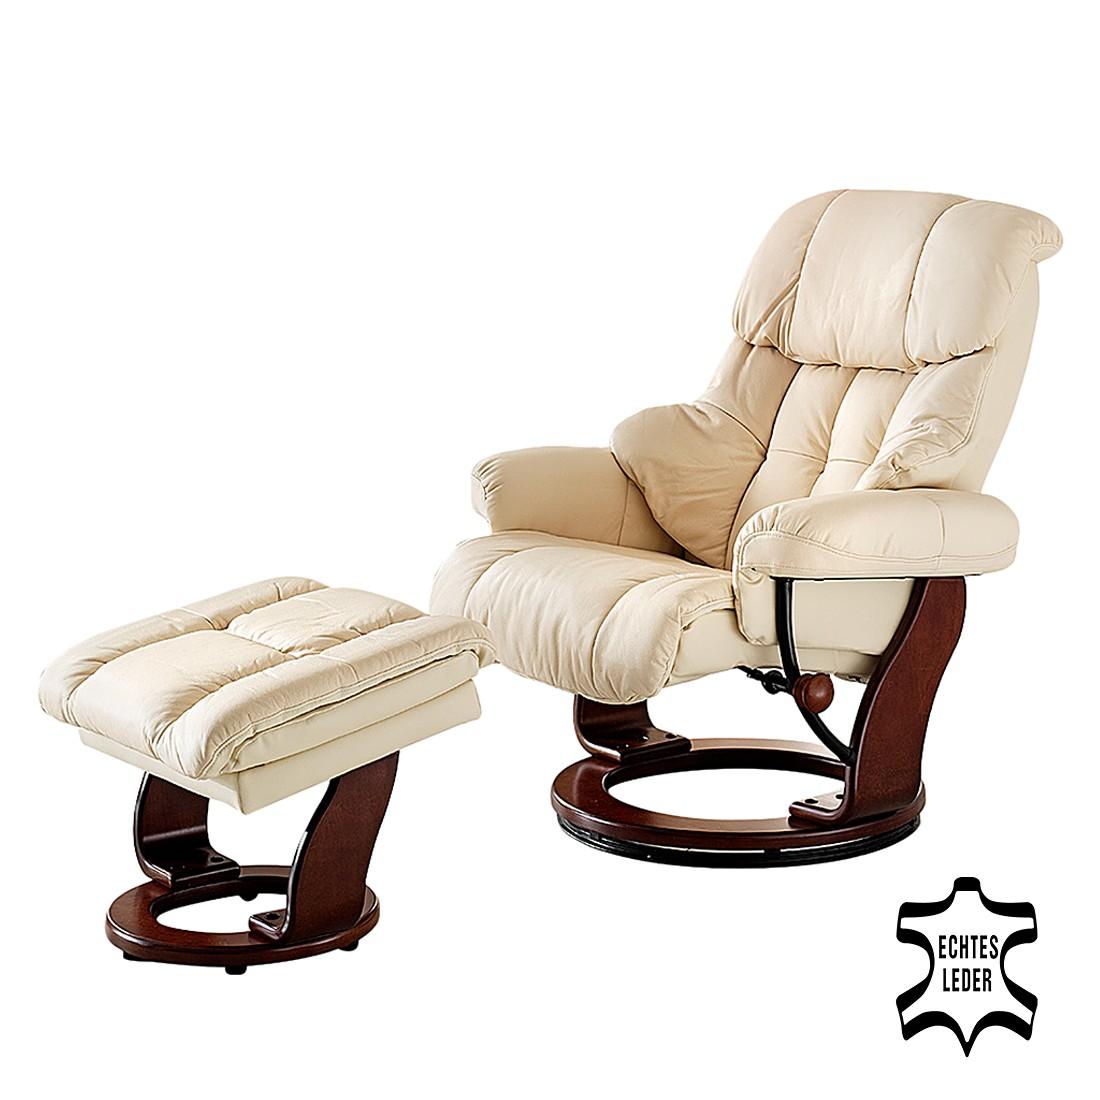 relaxsessel canillo ii mit hocker microfaser braun bellinzona g nstig kaufen. Black Bedroom Furniture Sets. Home Design Ideas